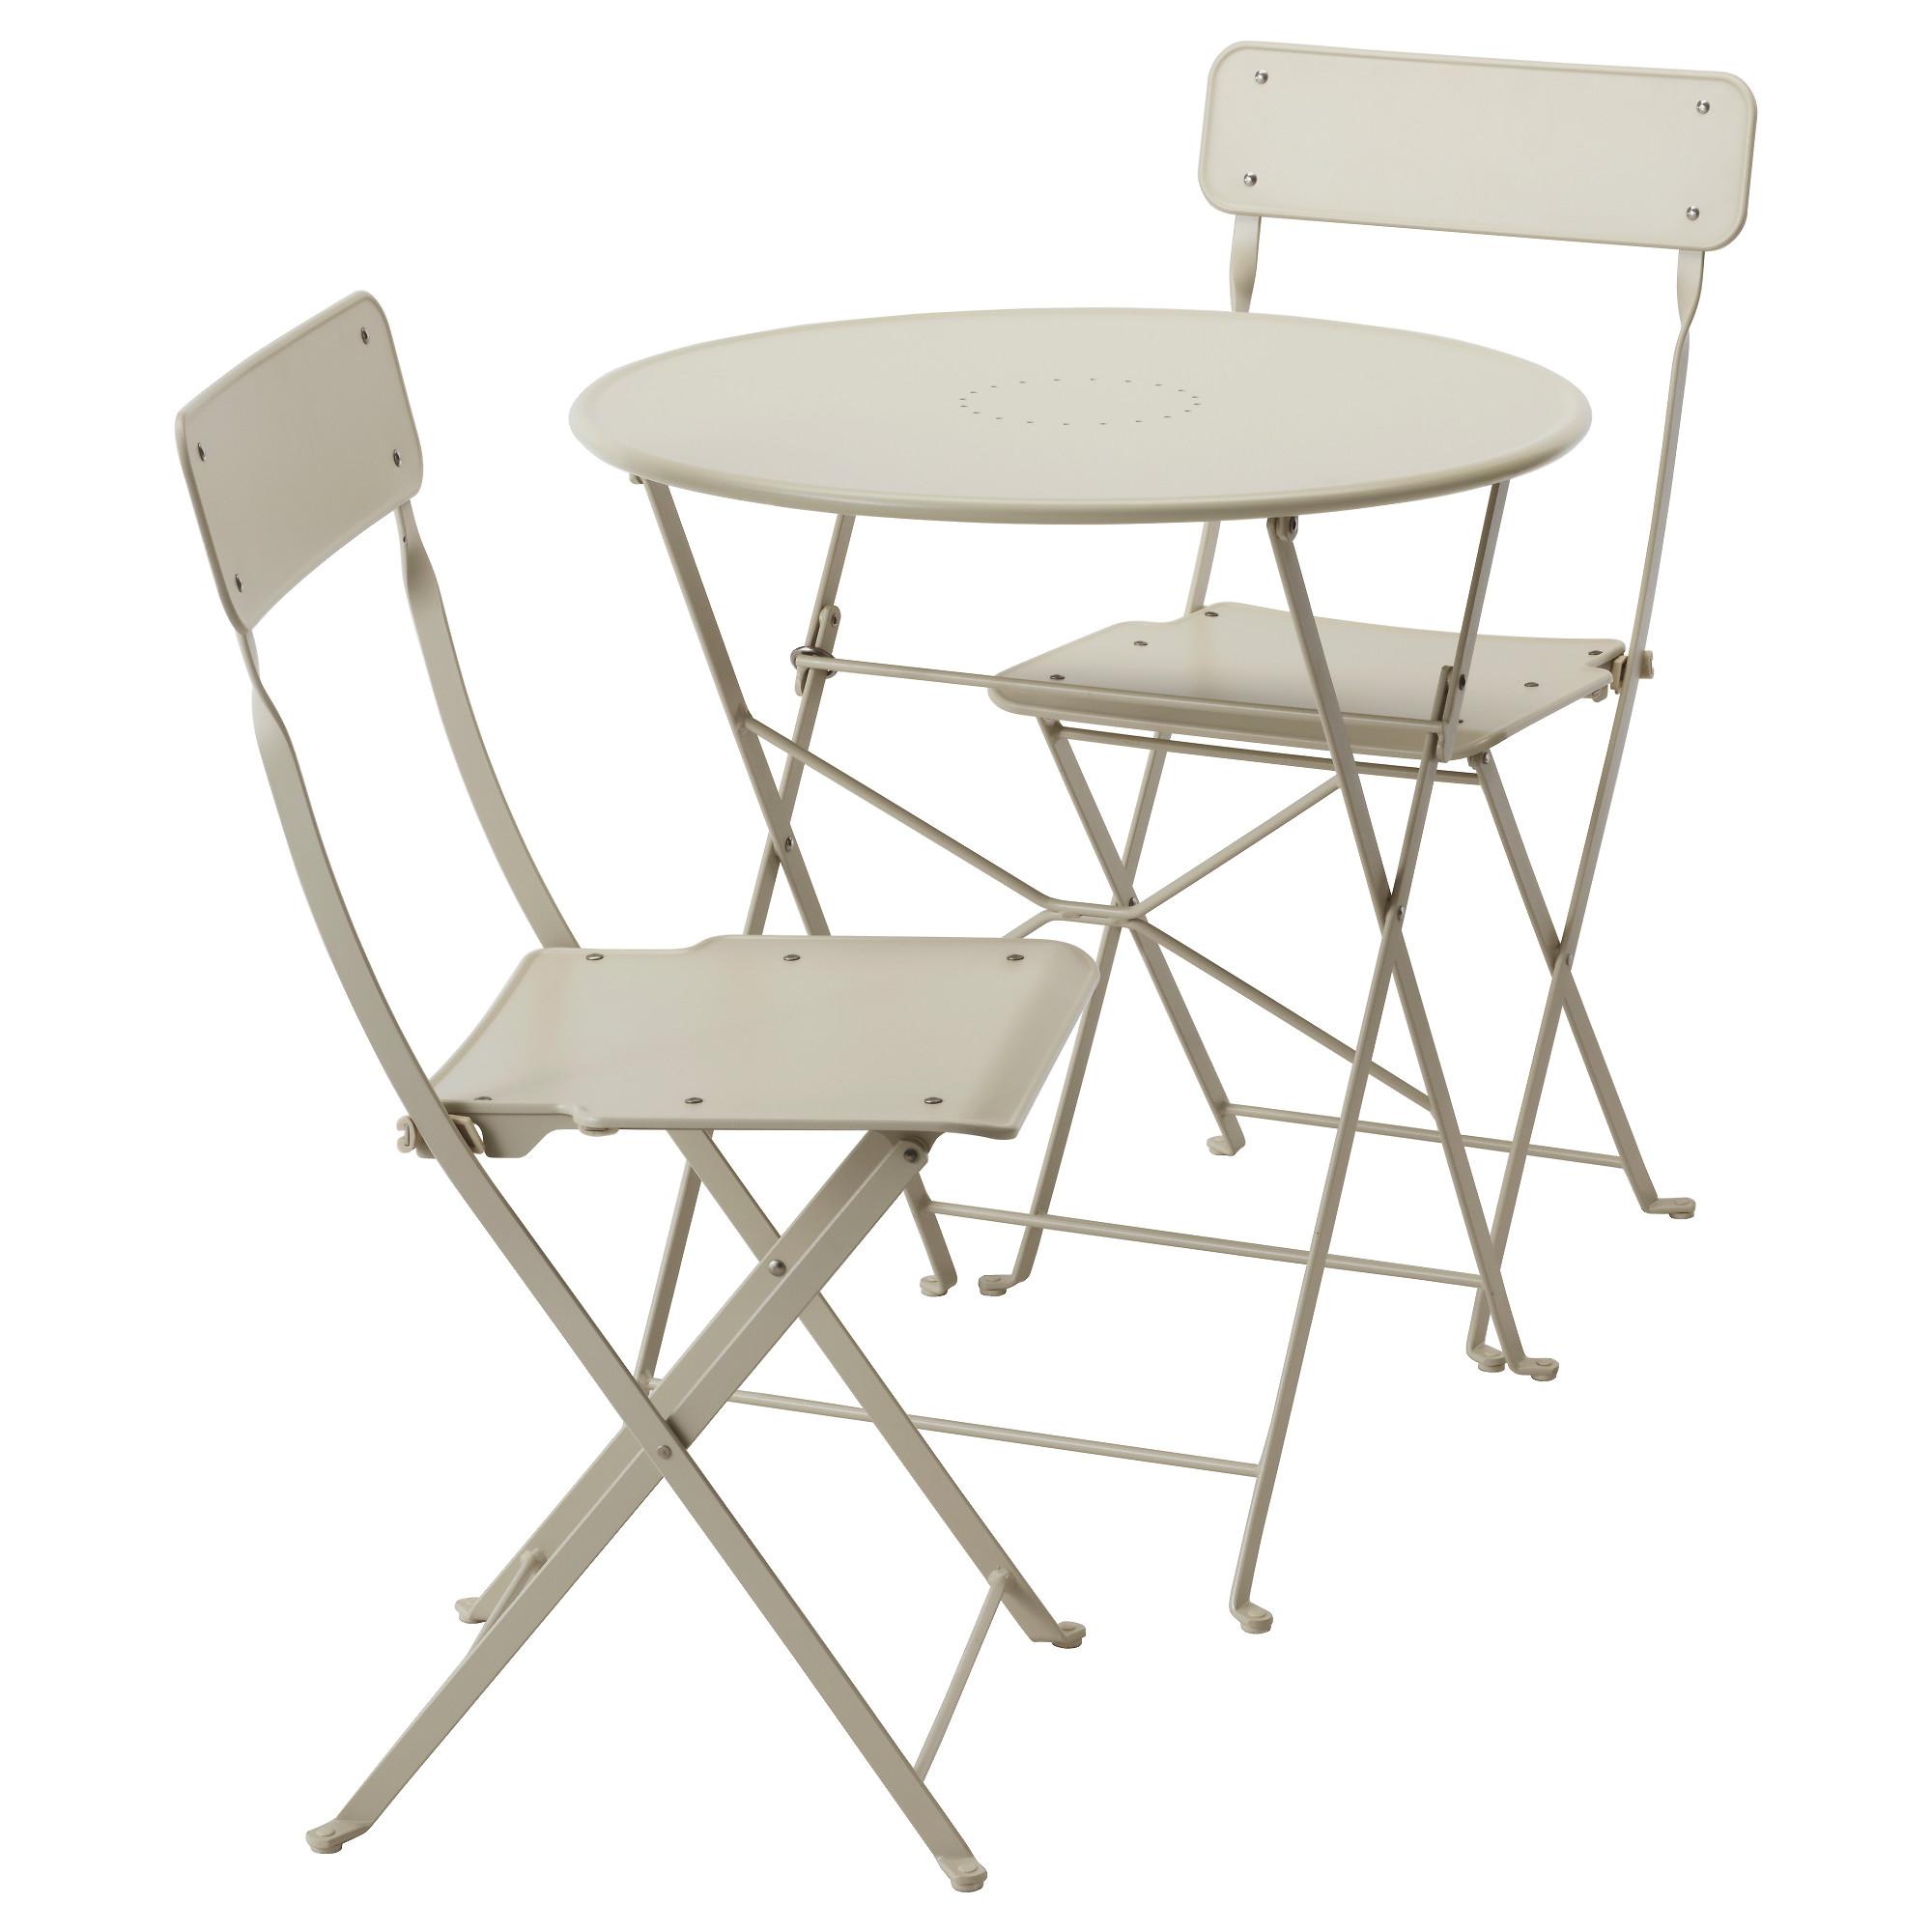 Ikea Outdoor Furniture Perth Australia